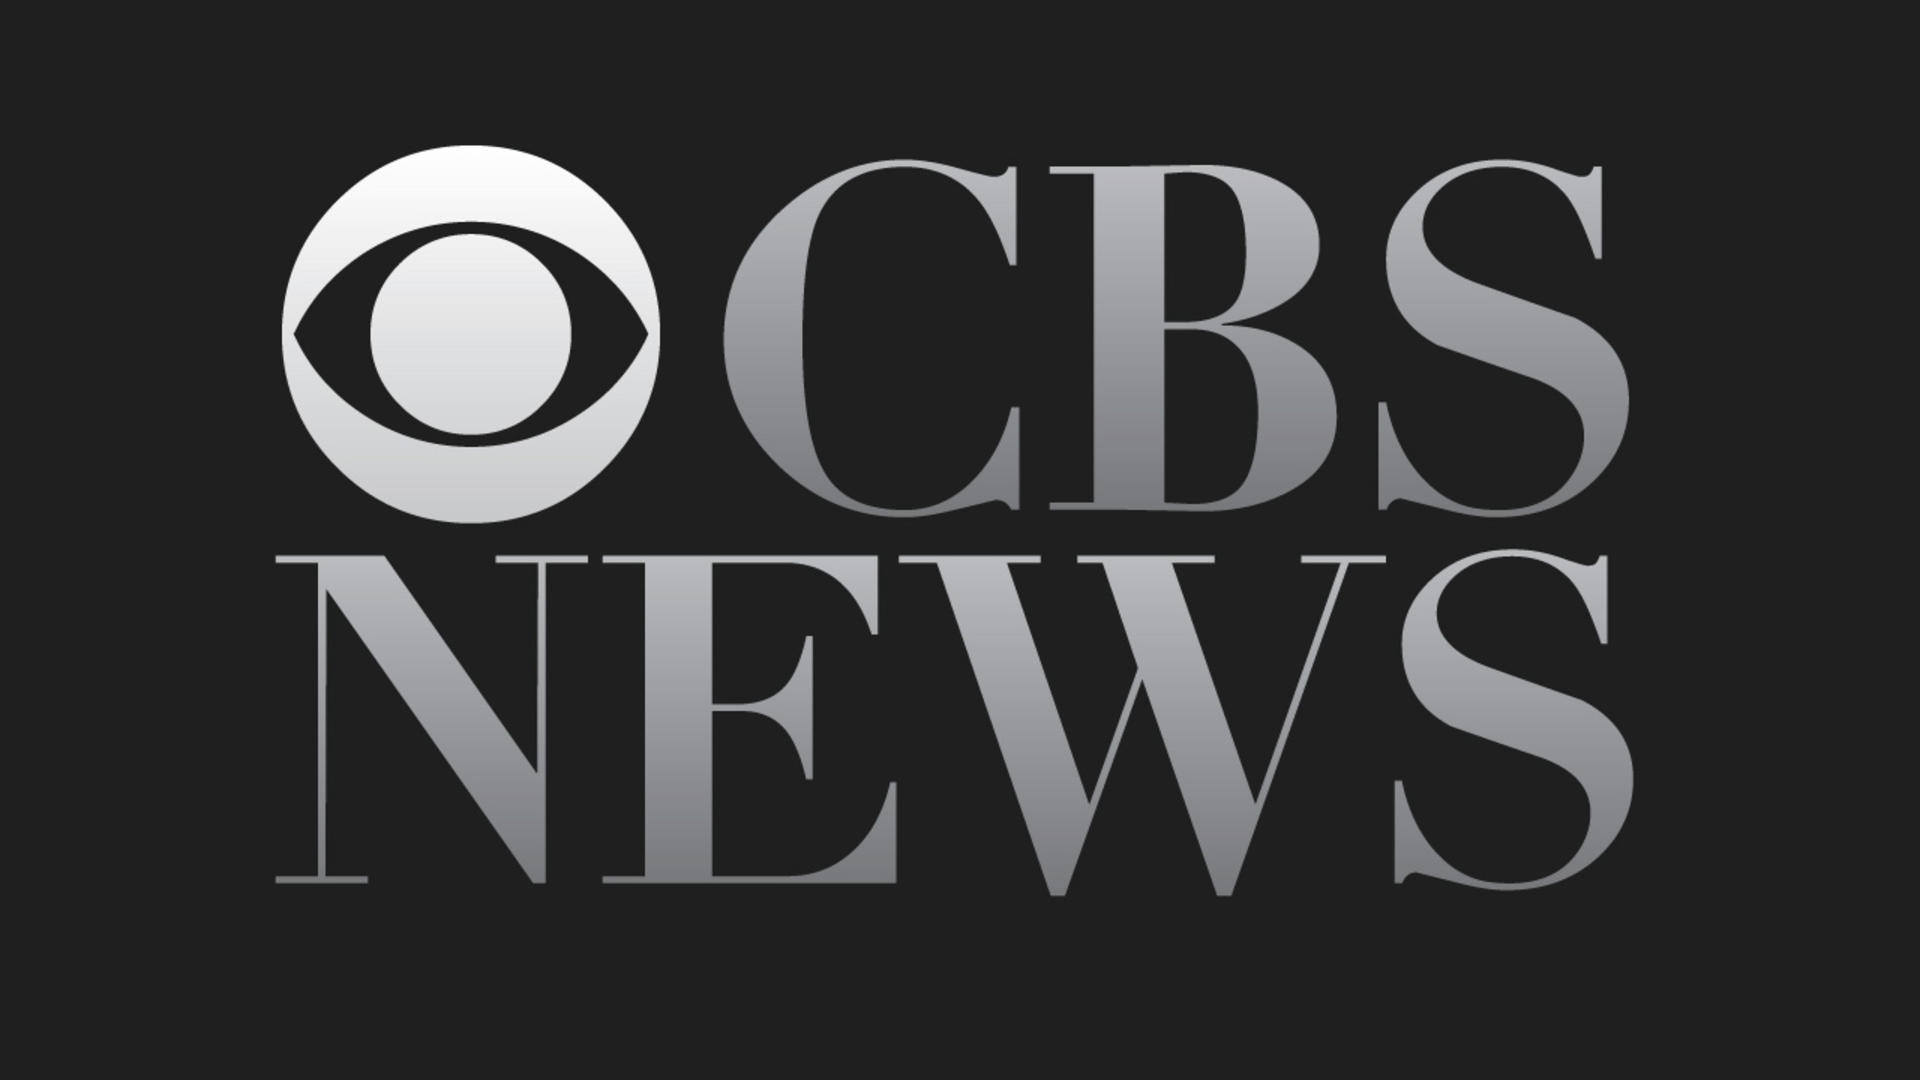 Live News Stream Watch Cbsn 2 Free 24 7 Online Streaming News Cbs News